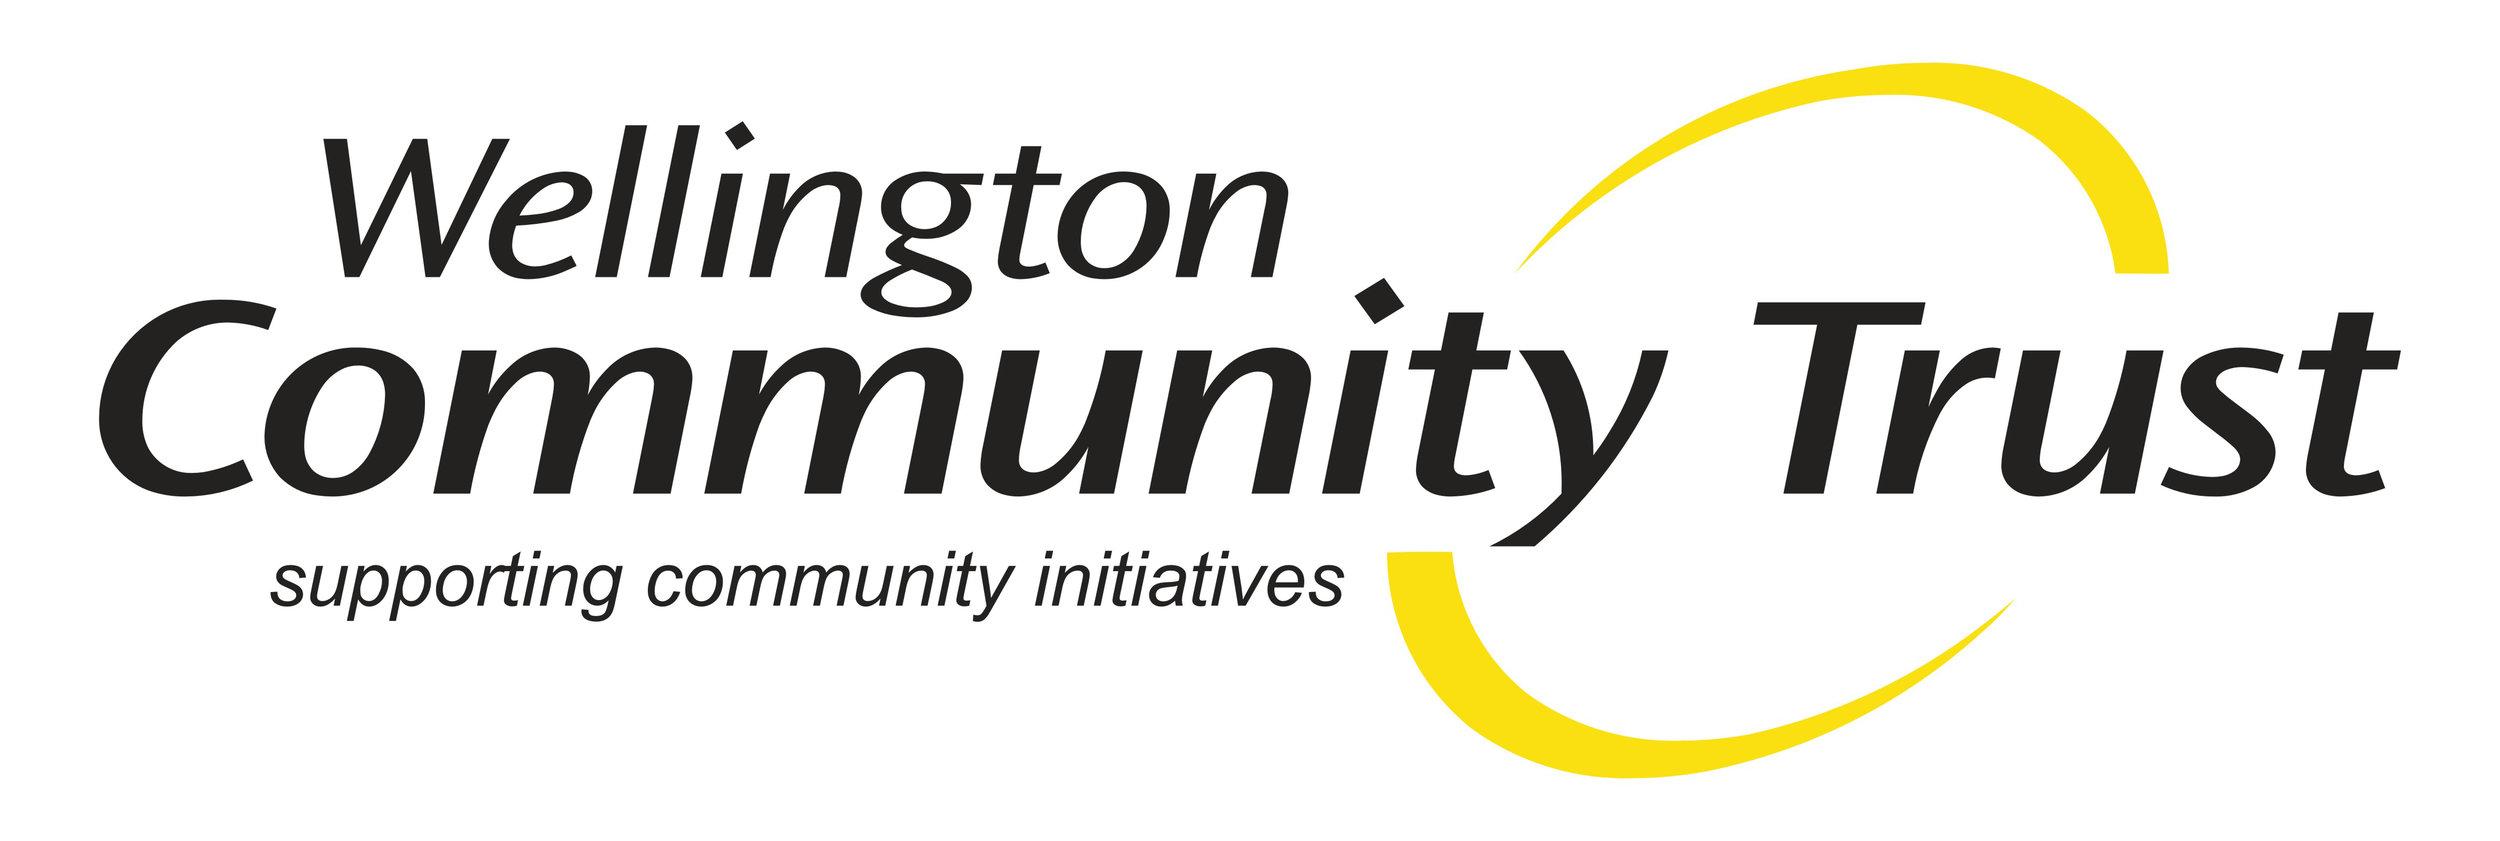 Wellington Community Trust